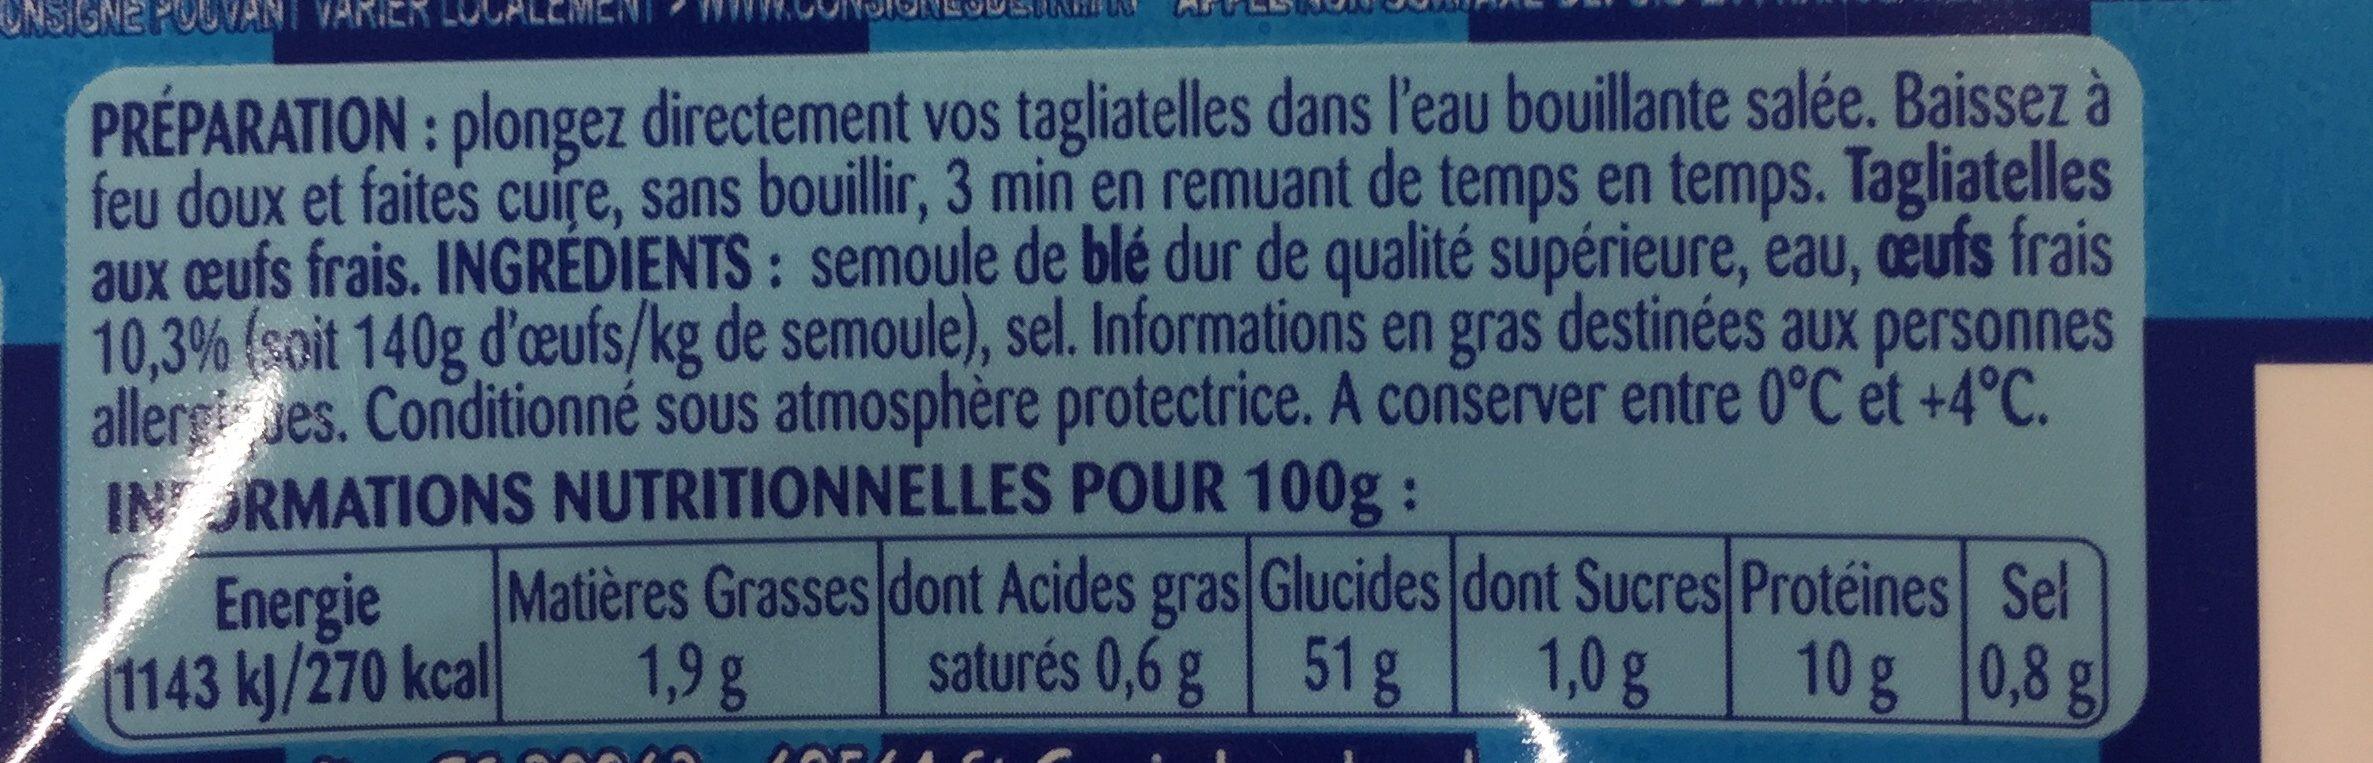 Tagliatelles larges - Ingredients